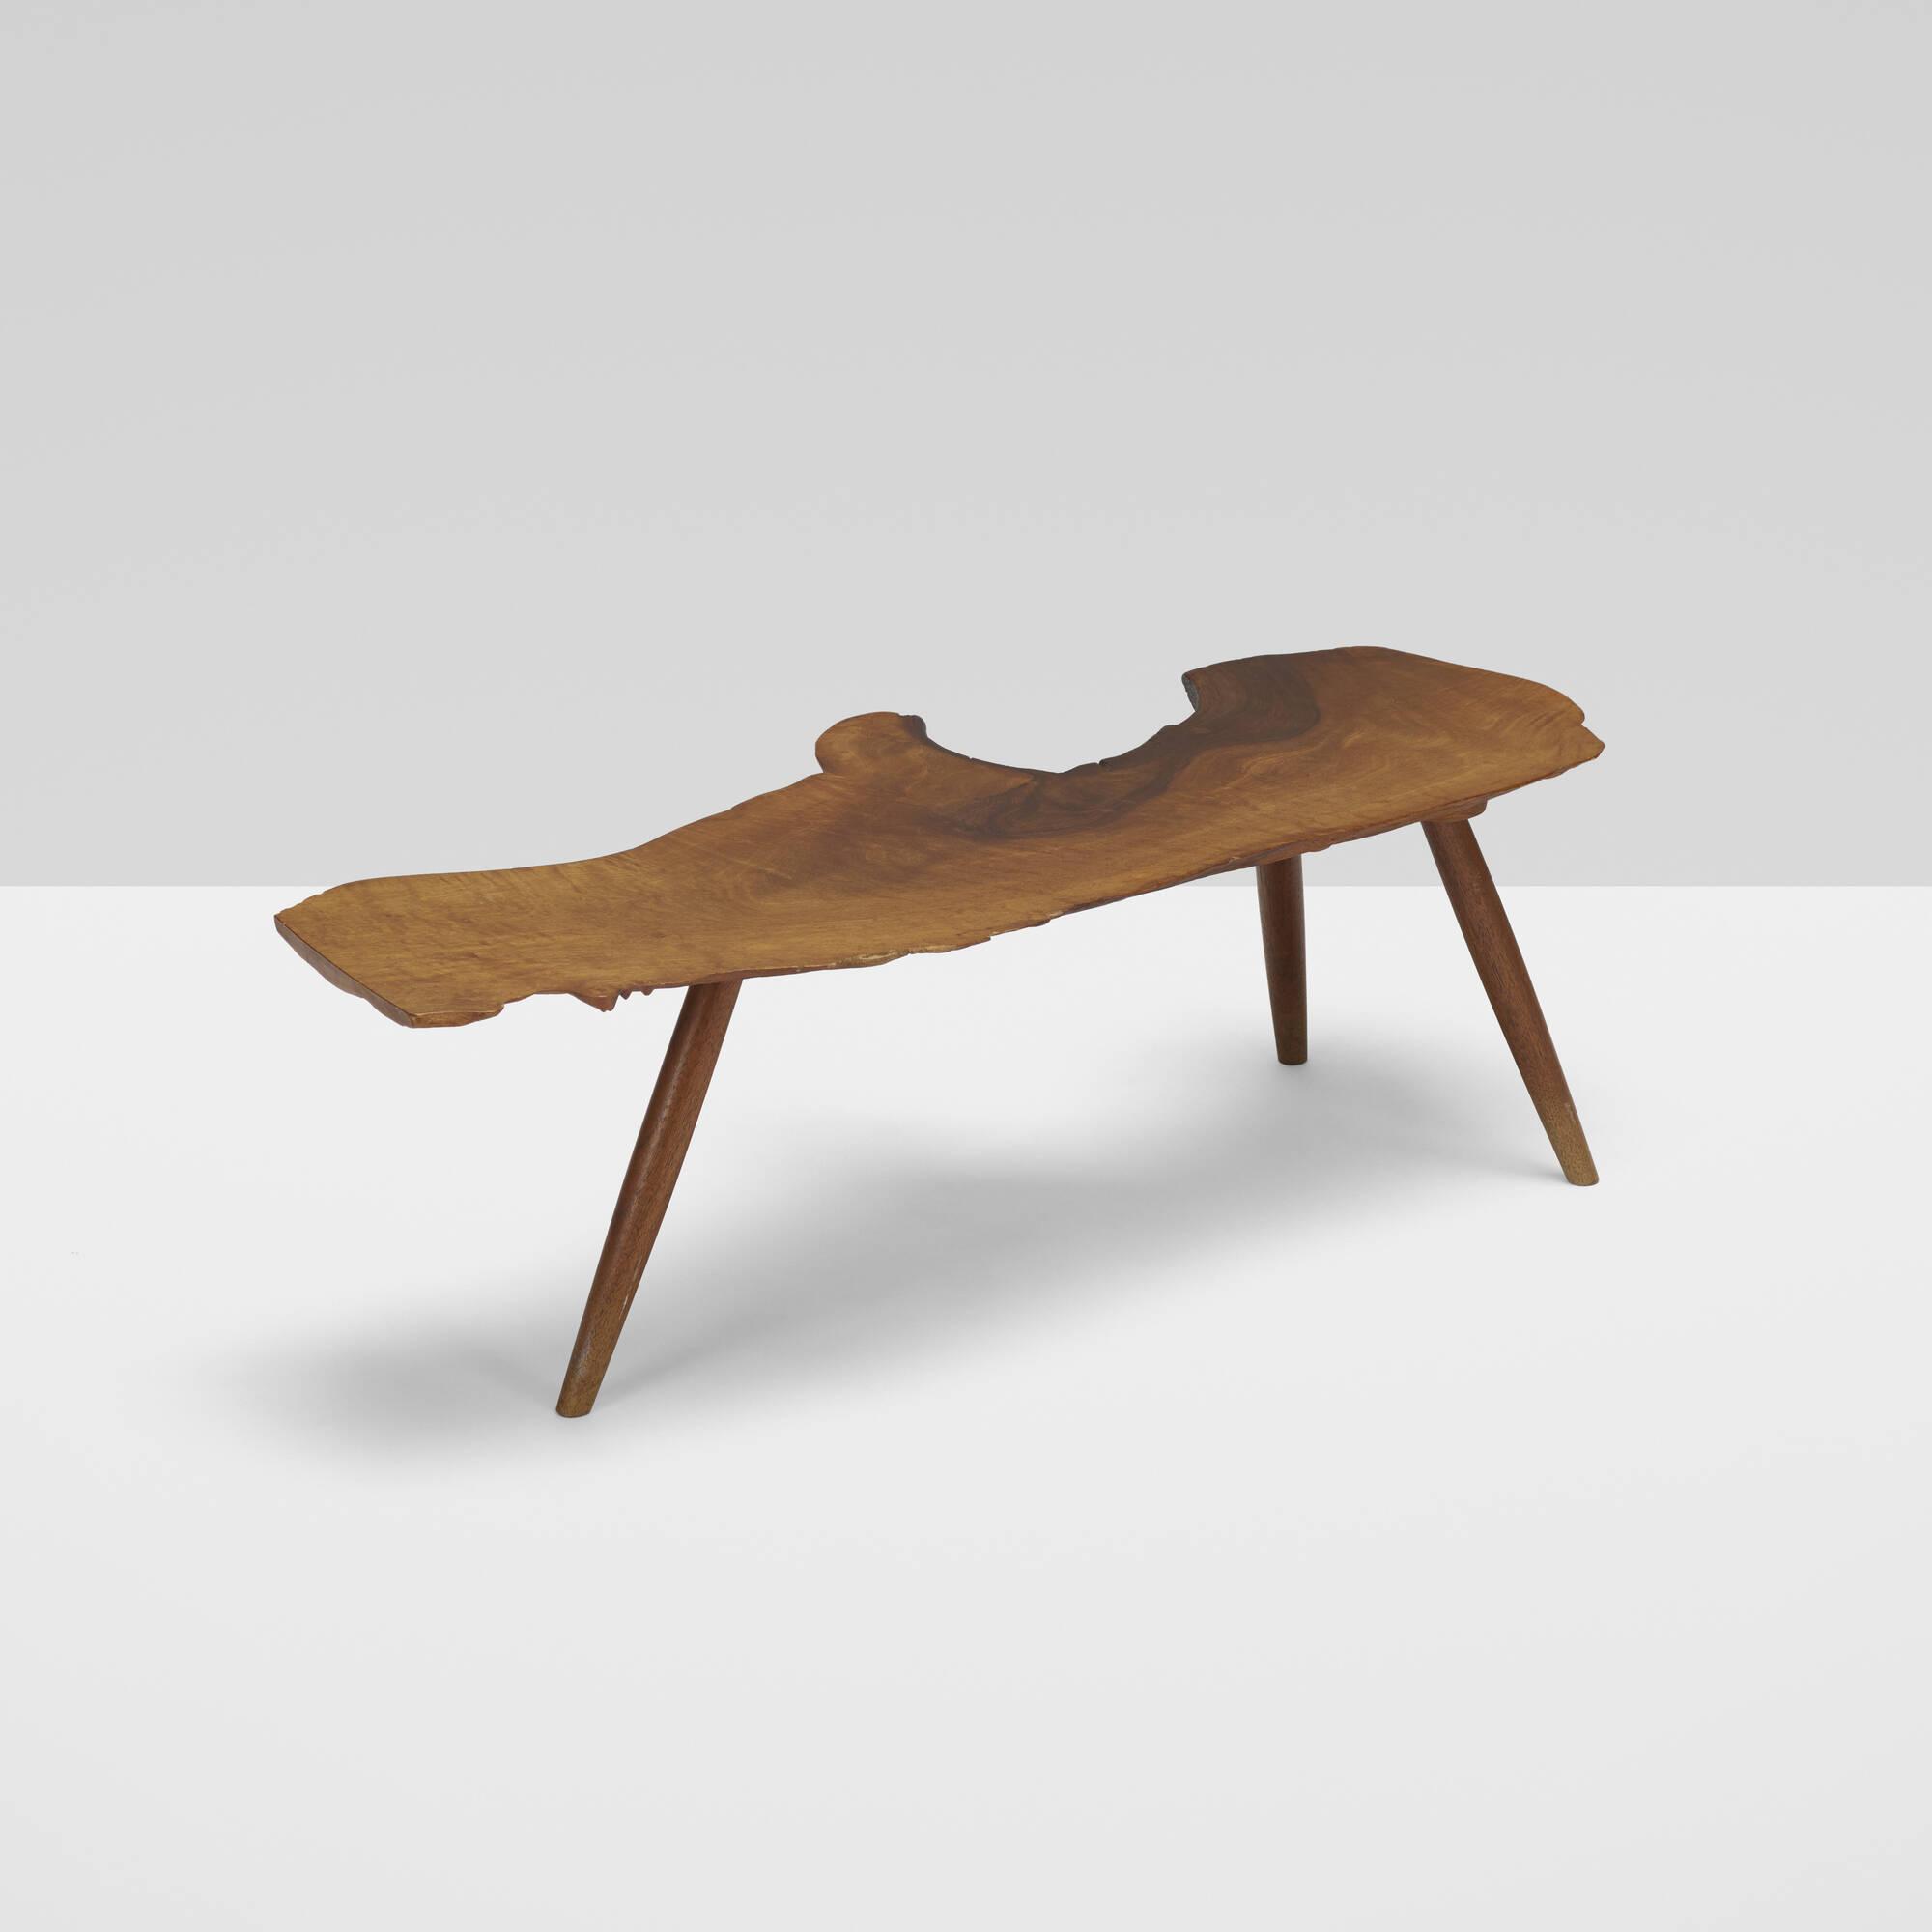 101: George Nakashima / Slab coffee table (1 of 3)